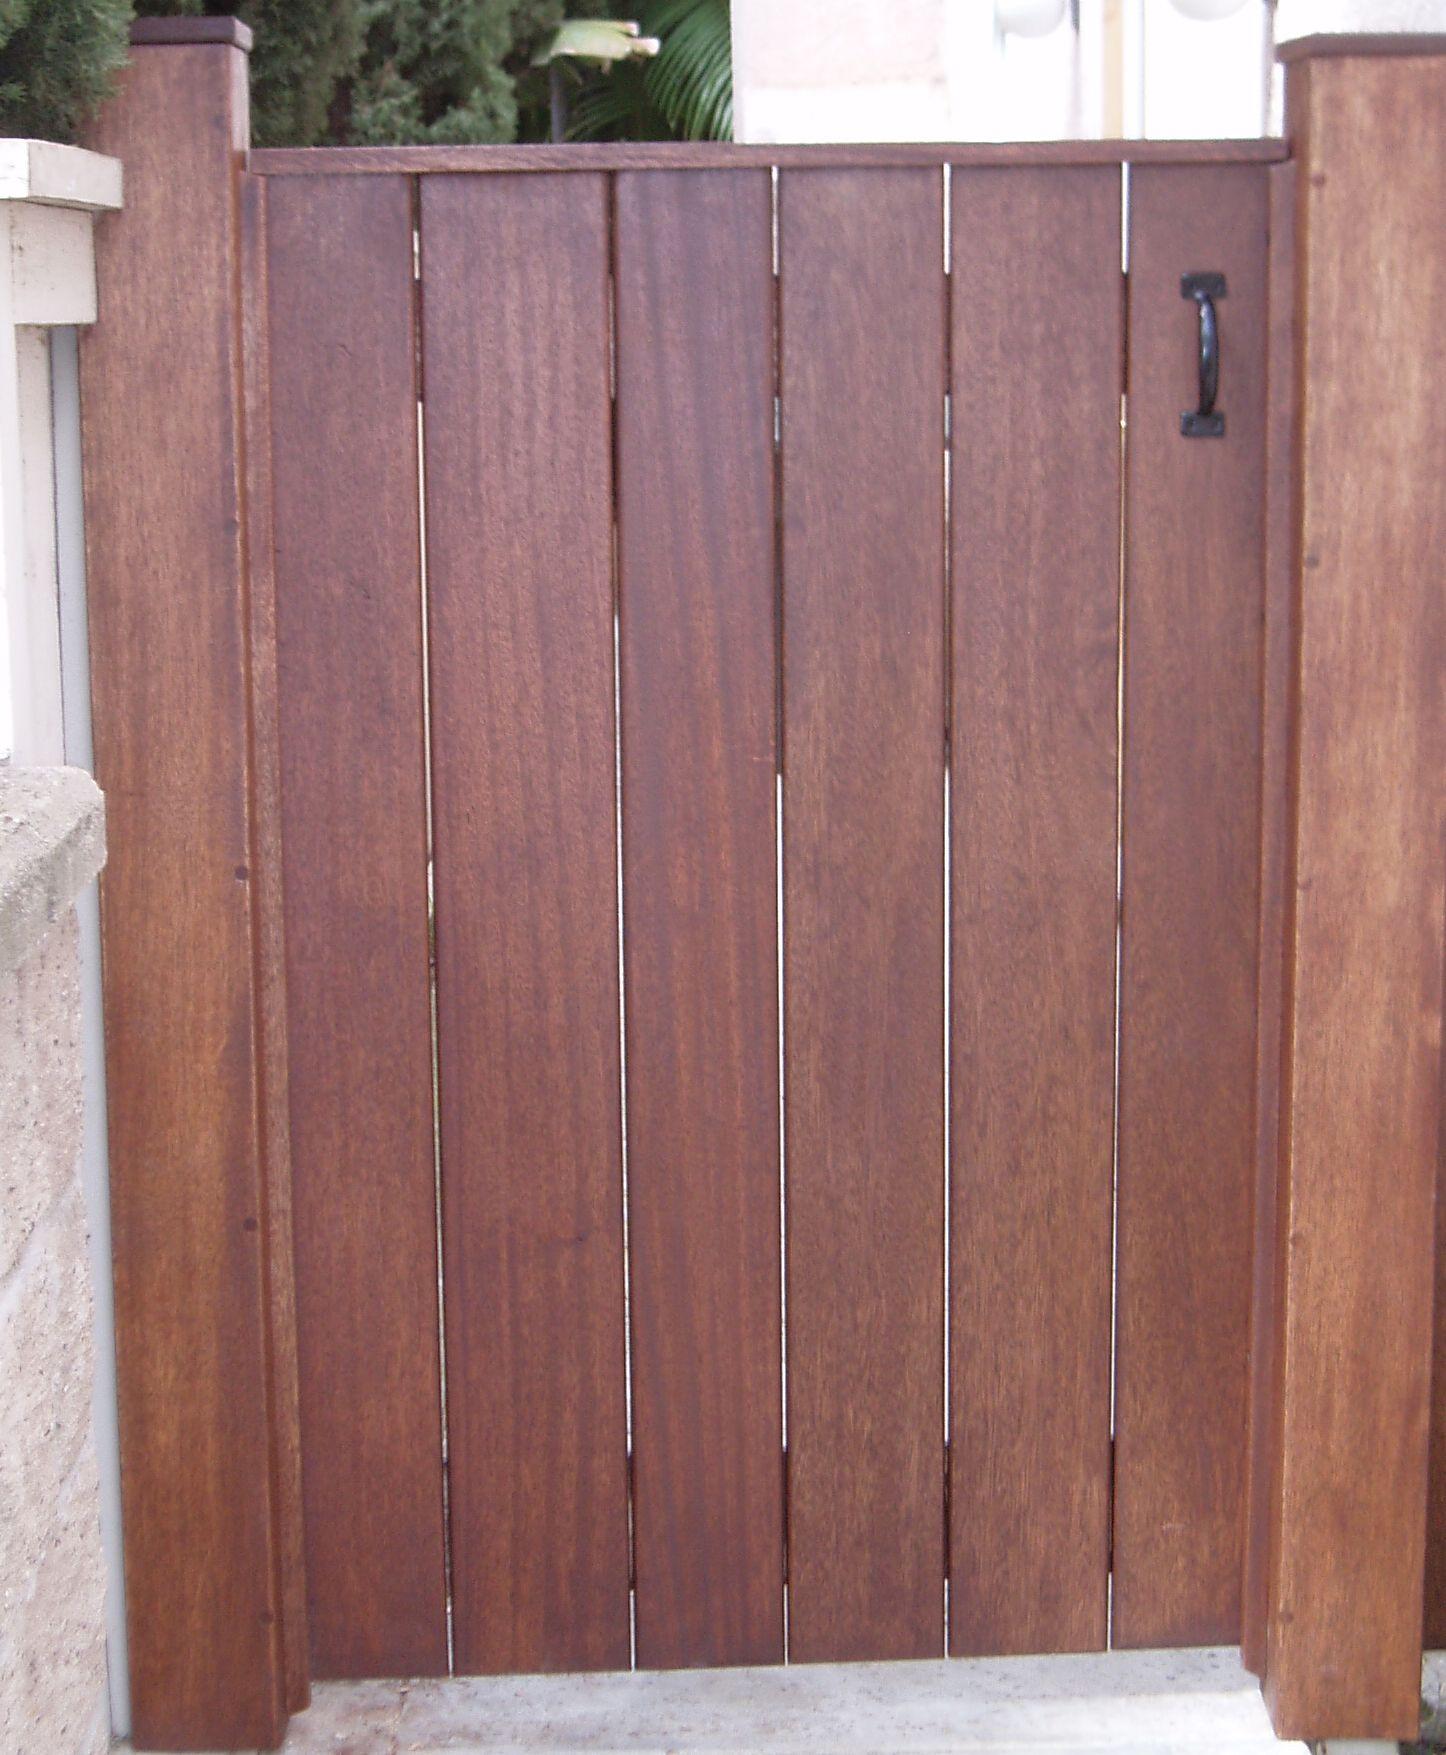 James custom wood gates home pinterest patios - Puertas para porches ...